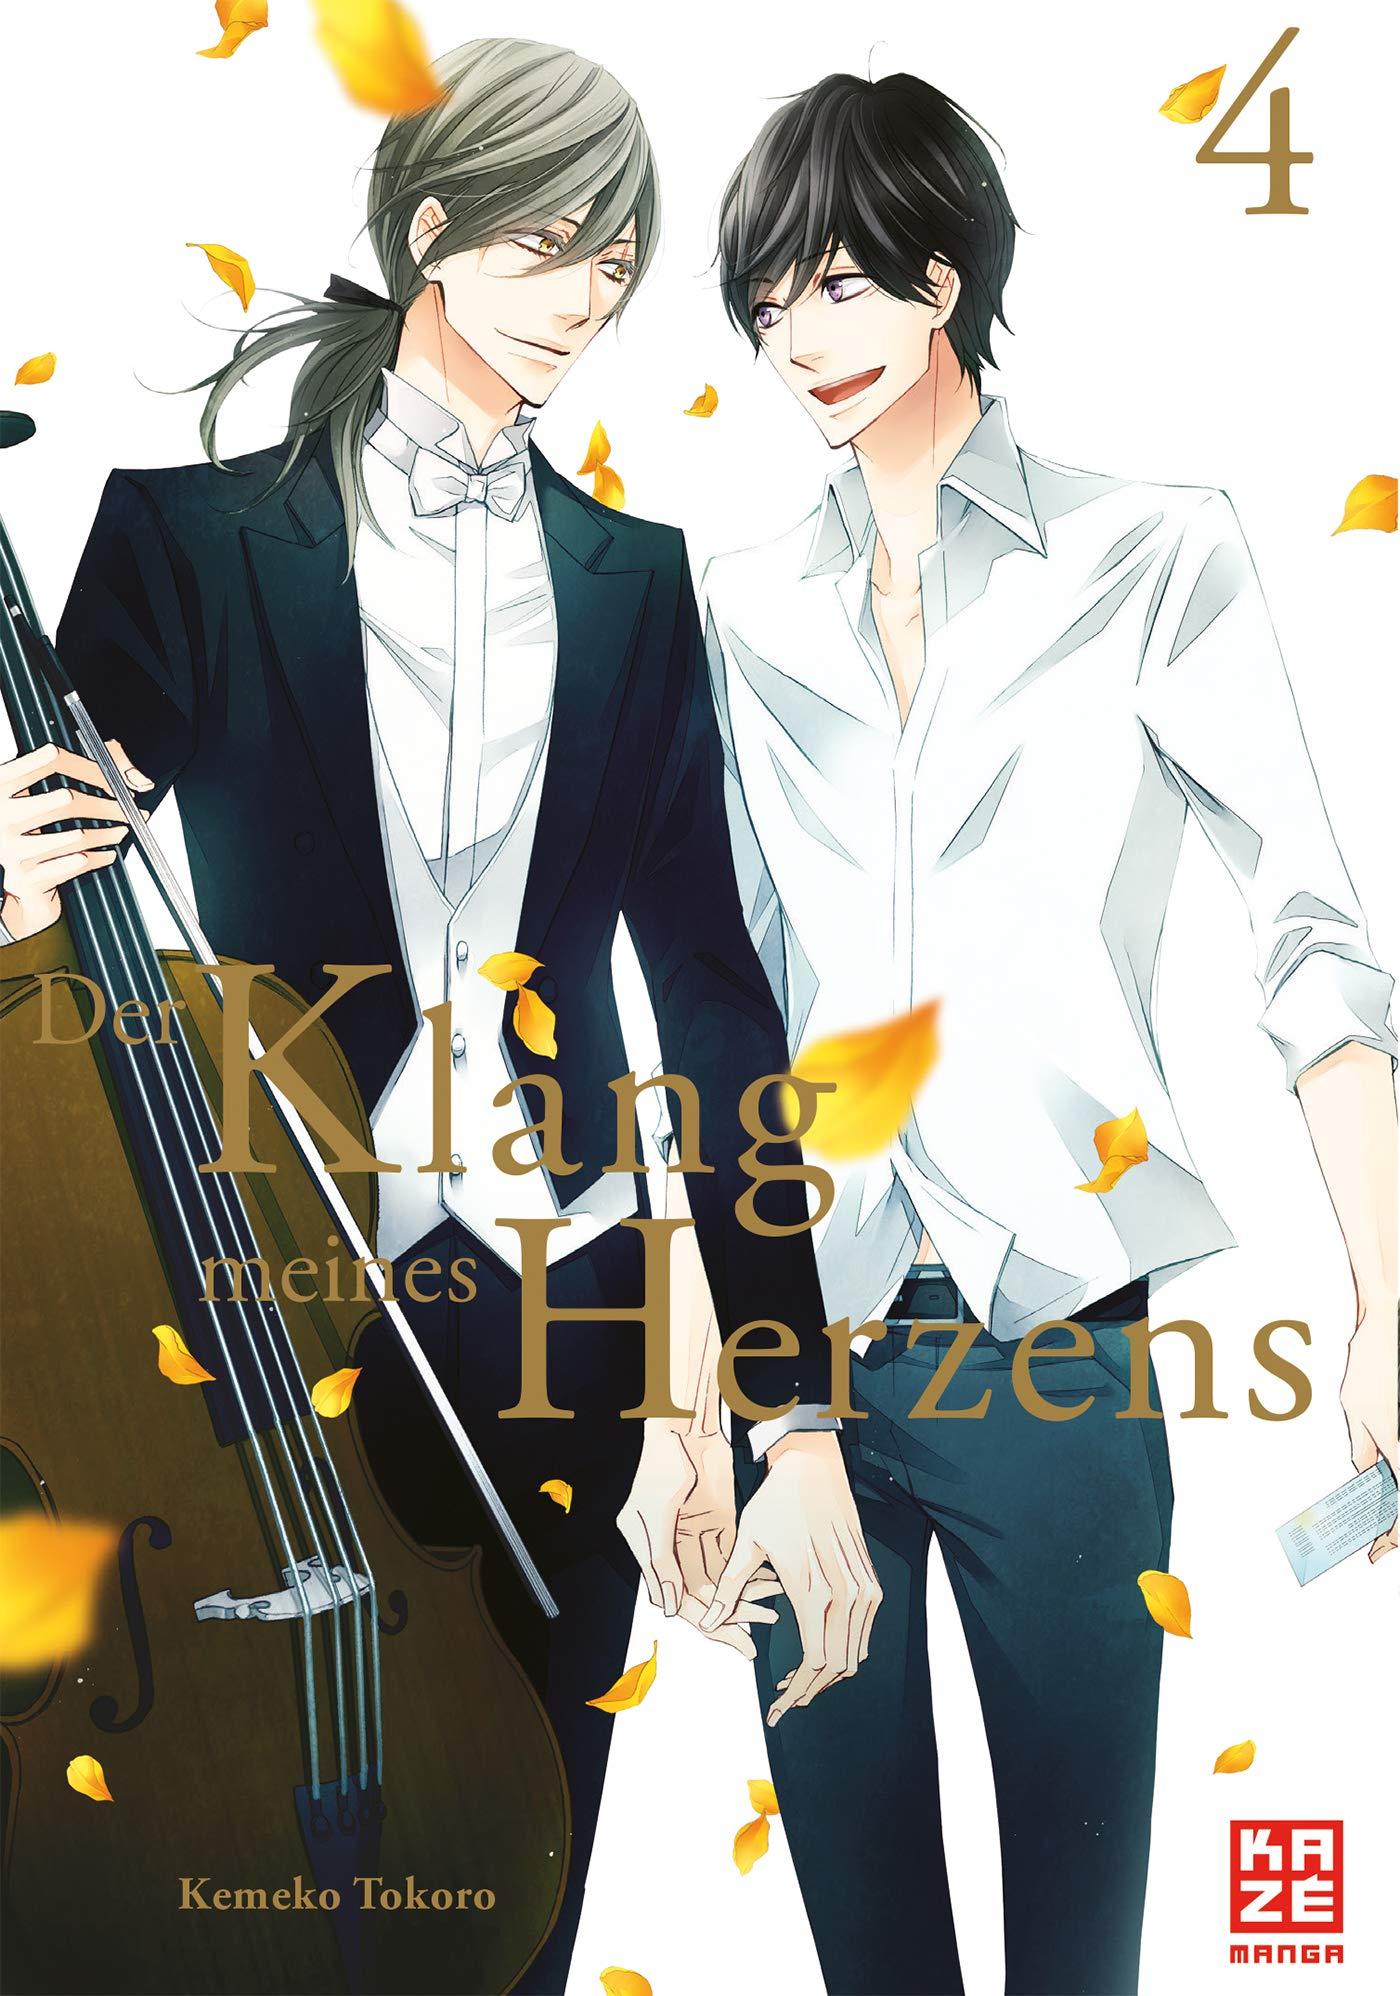 Der Klang meines Herzens 04 Taschenbuch – 4. Oktober 2018 Kemeko Tokoro Etsuko Tabuchi Dorothea Überall KAZÉ Manga